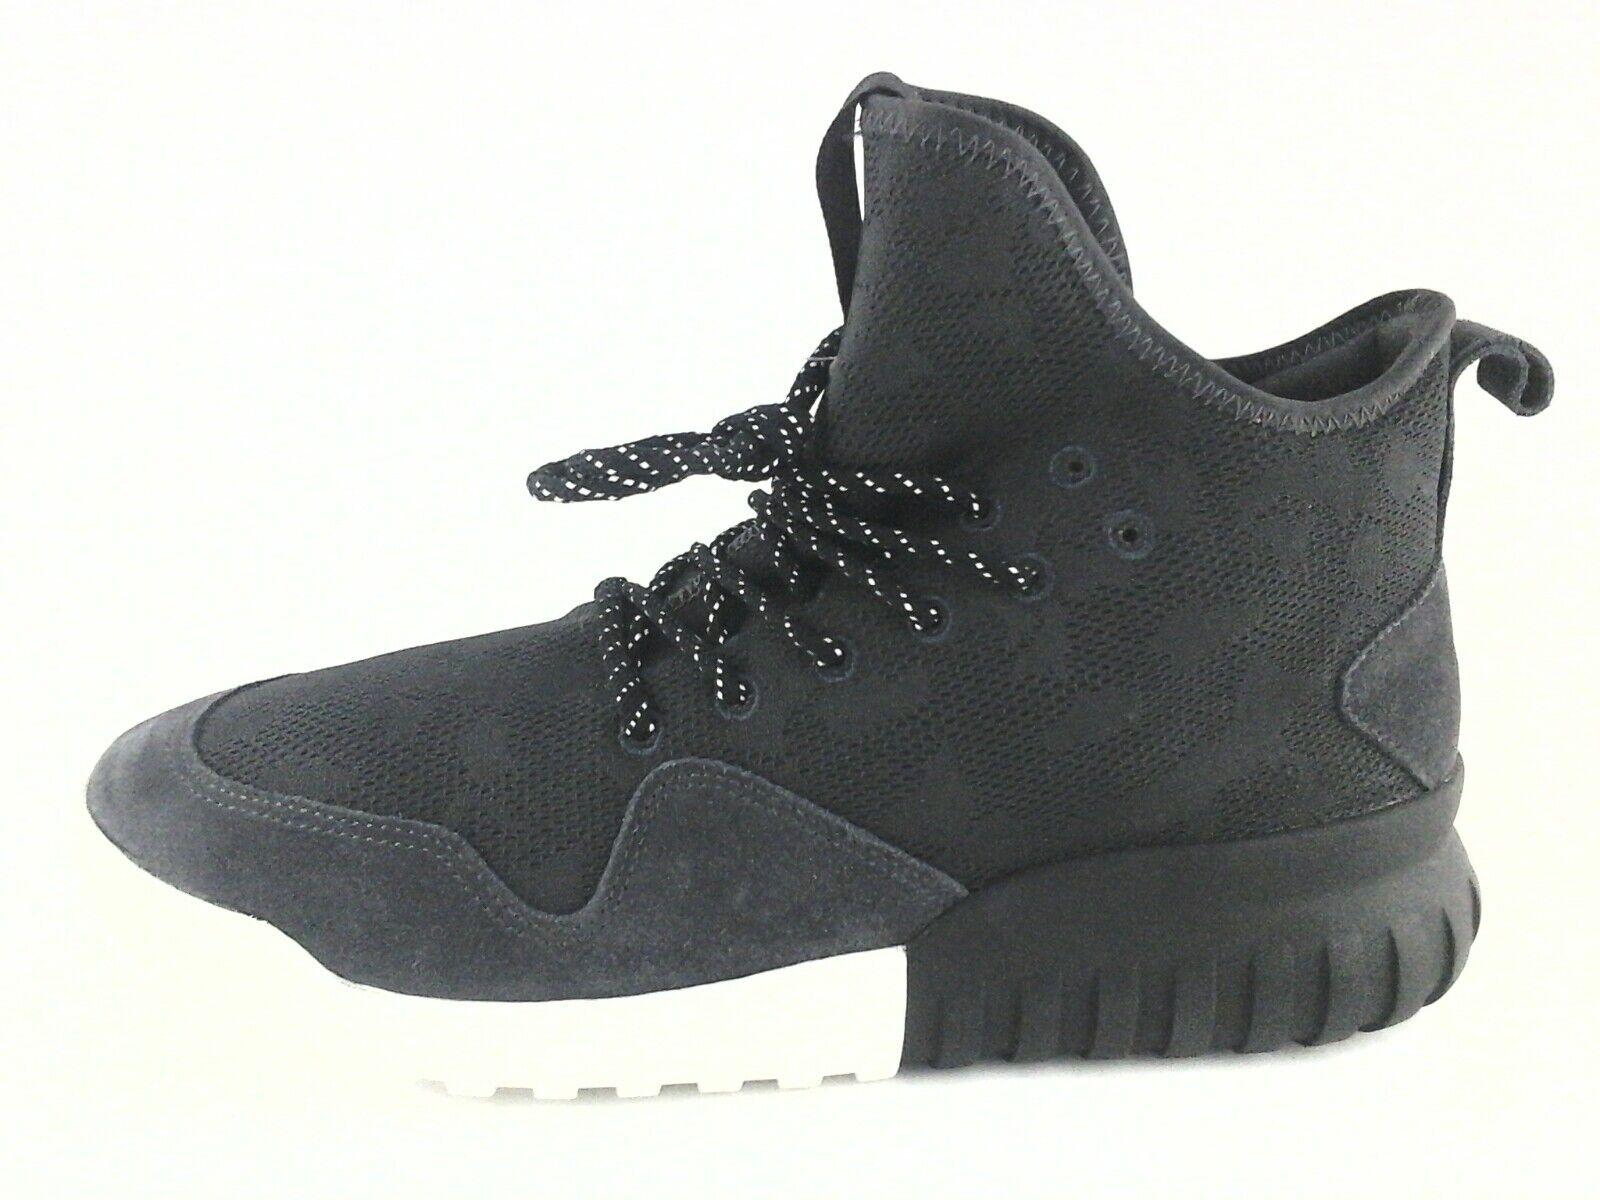 Adidas Original Hombre Tubular X Camuflaje uncgd Mediados de alta Camuflaje X Negro Zapatos  WH BB8404 US 11.5 bad0dc